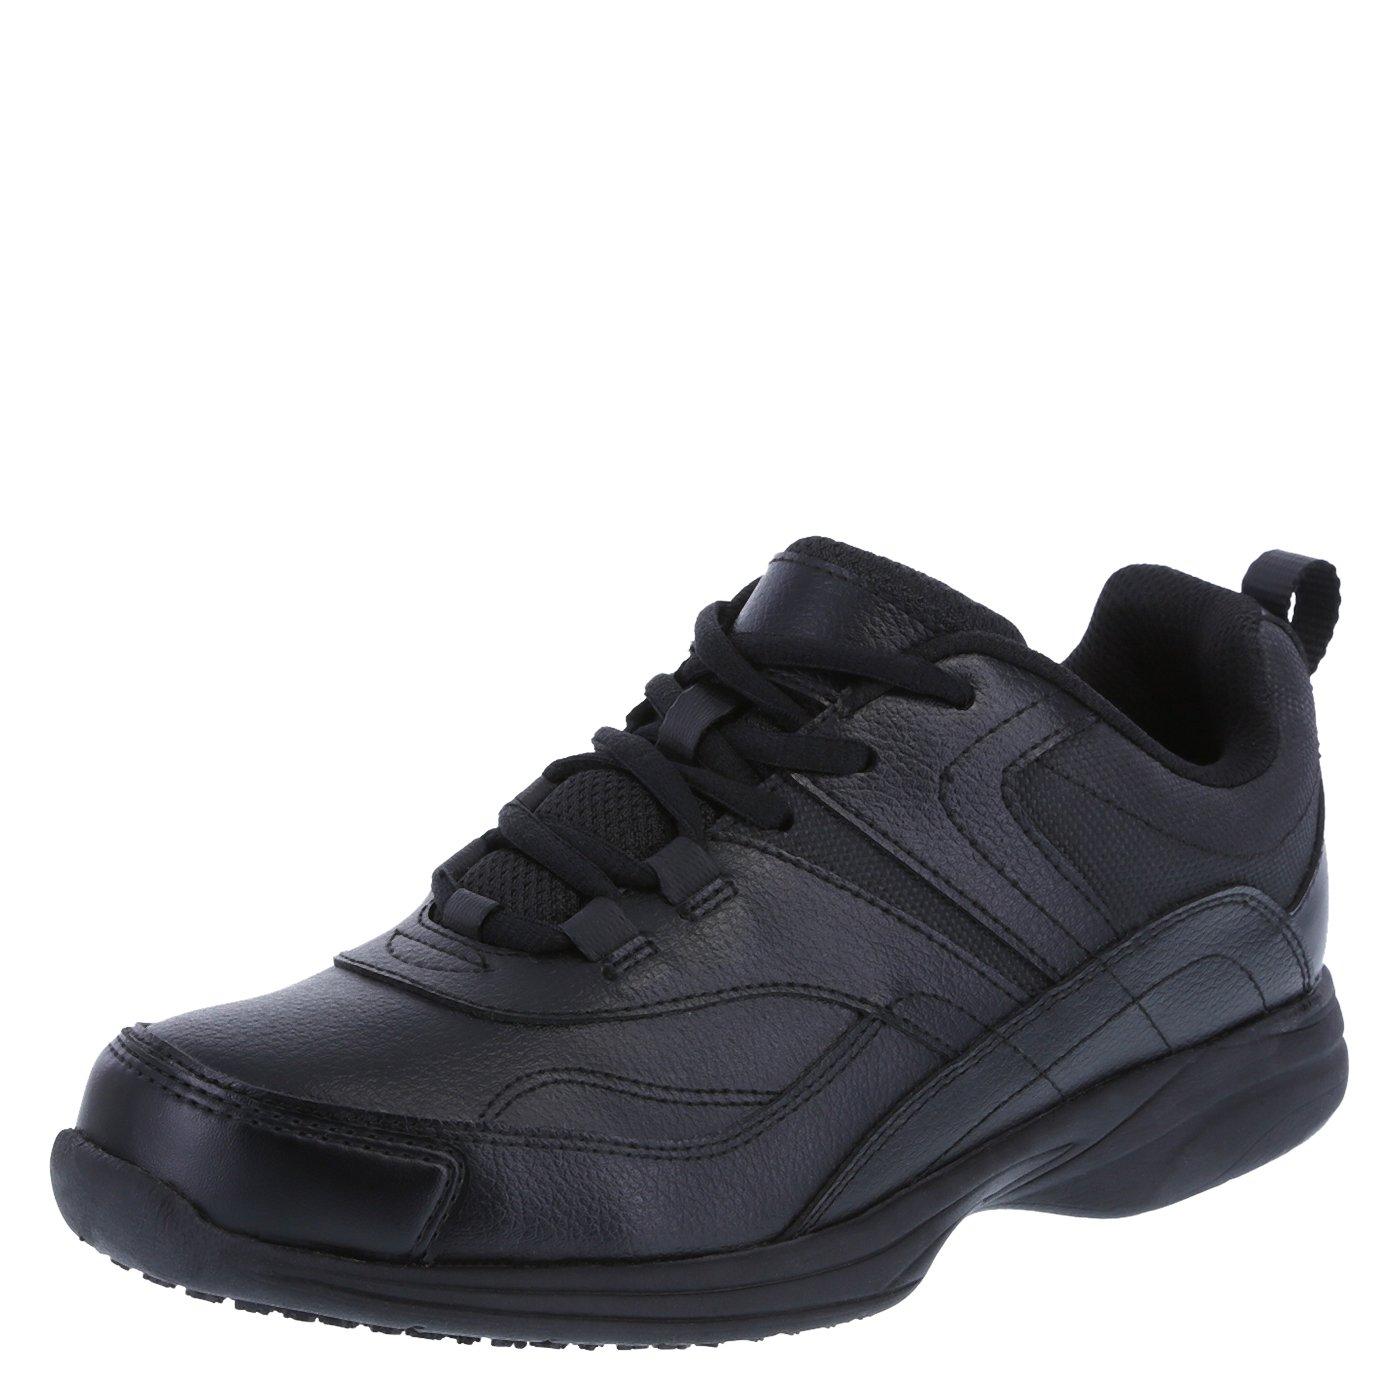 safeTstep Slip Resistant Women's Black Women's Athena Sneaker 6 Wide